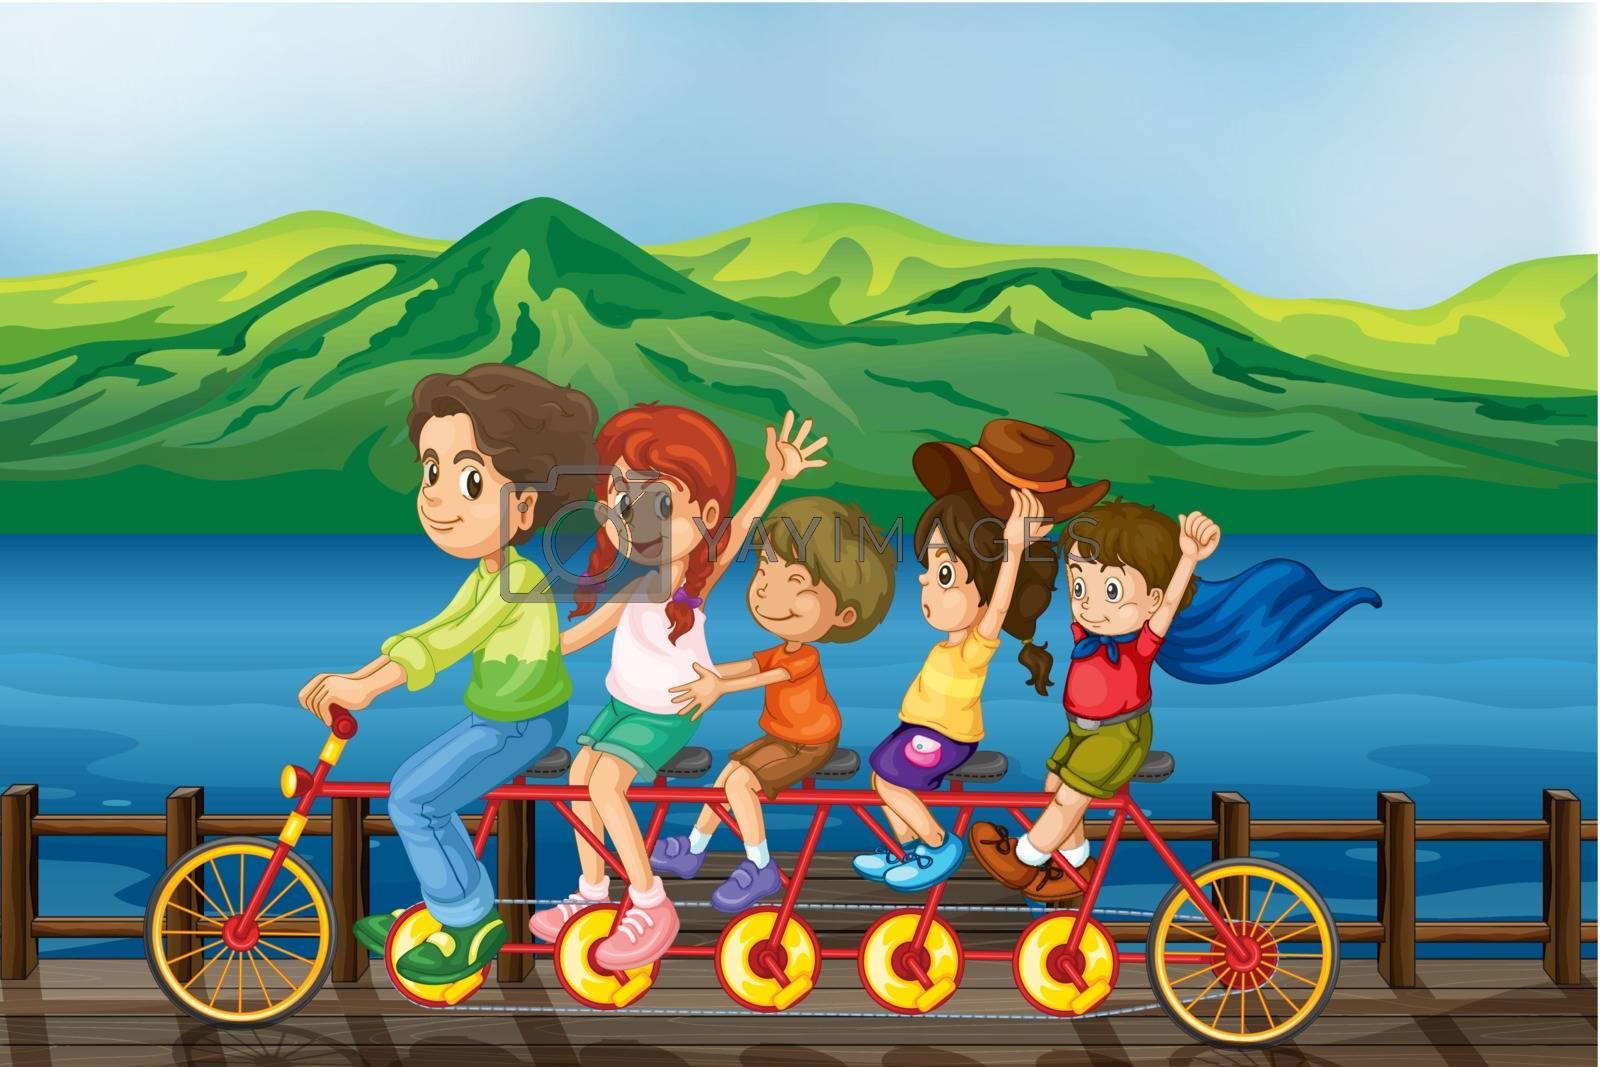 Illustration of kids biking at the bridge